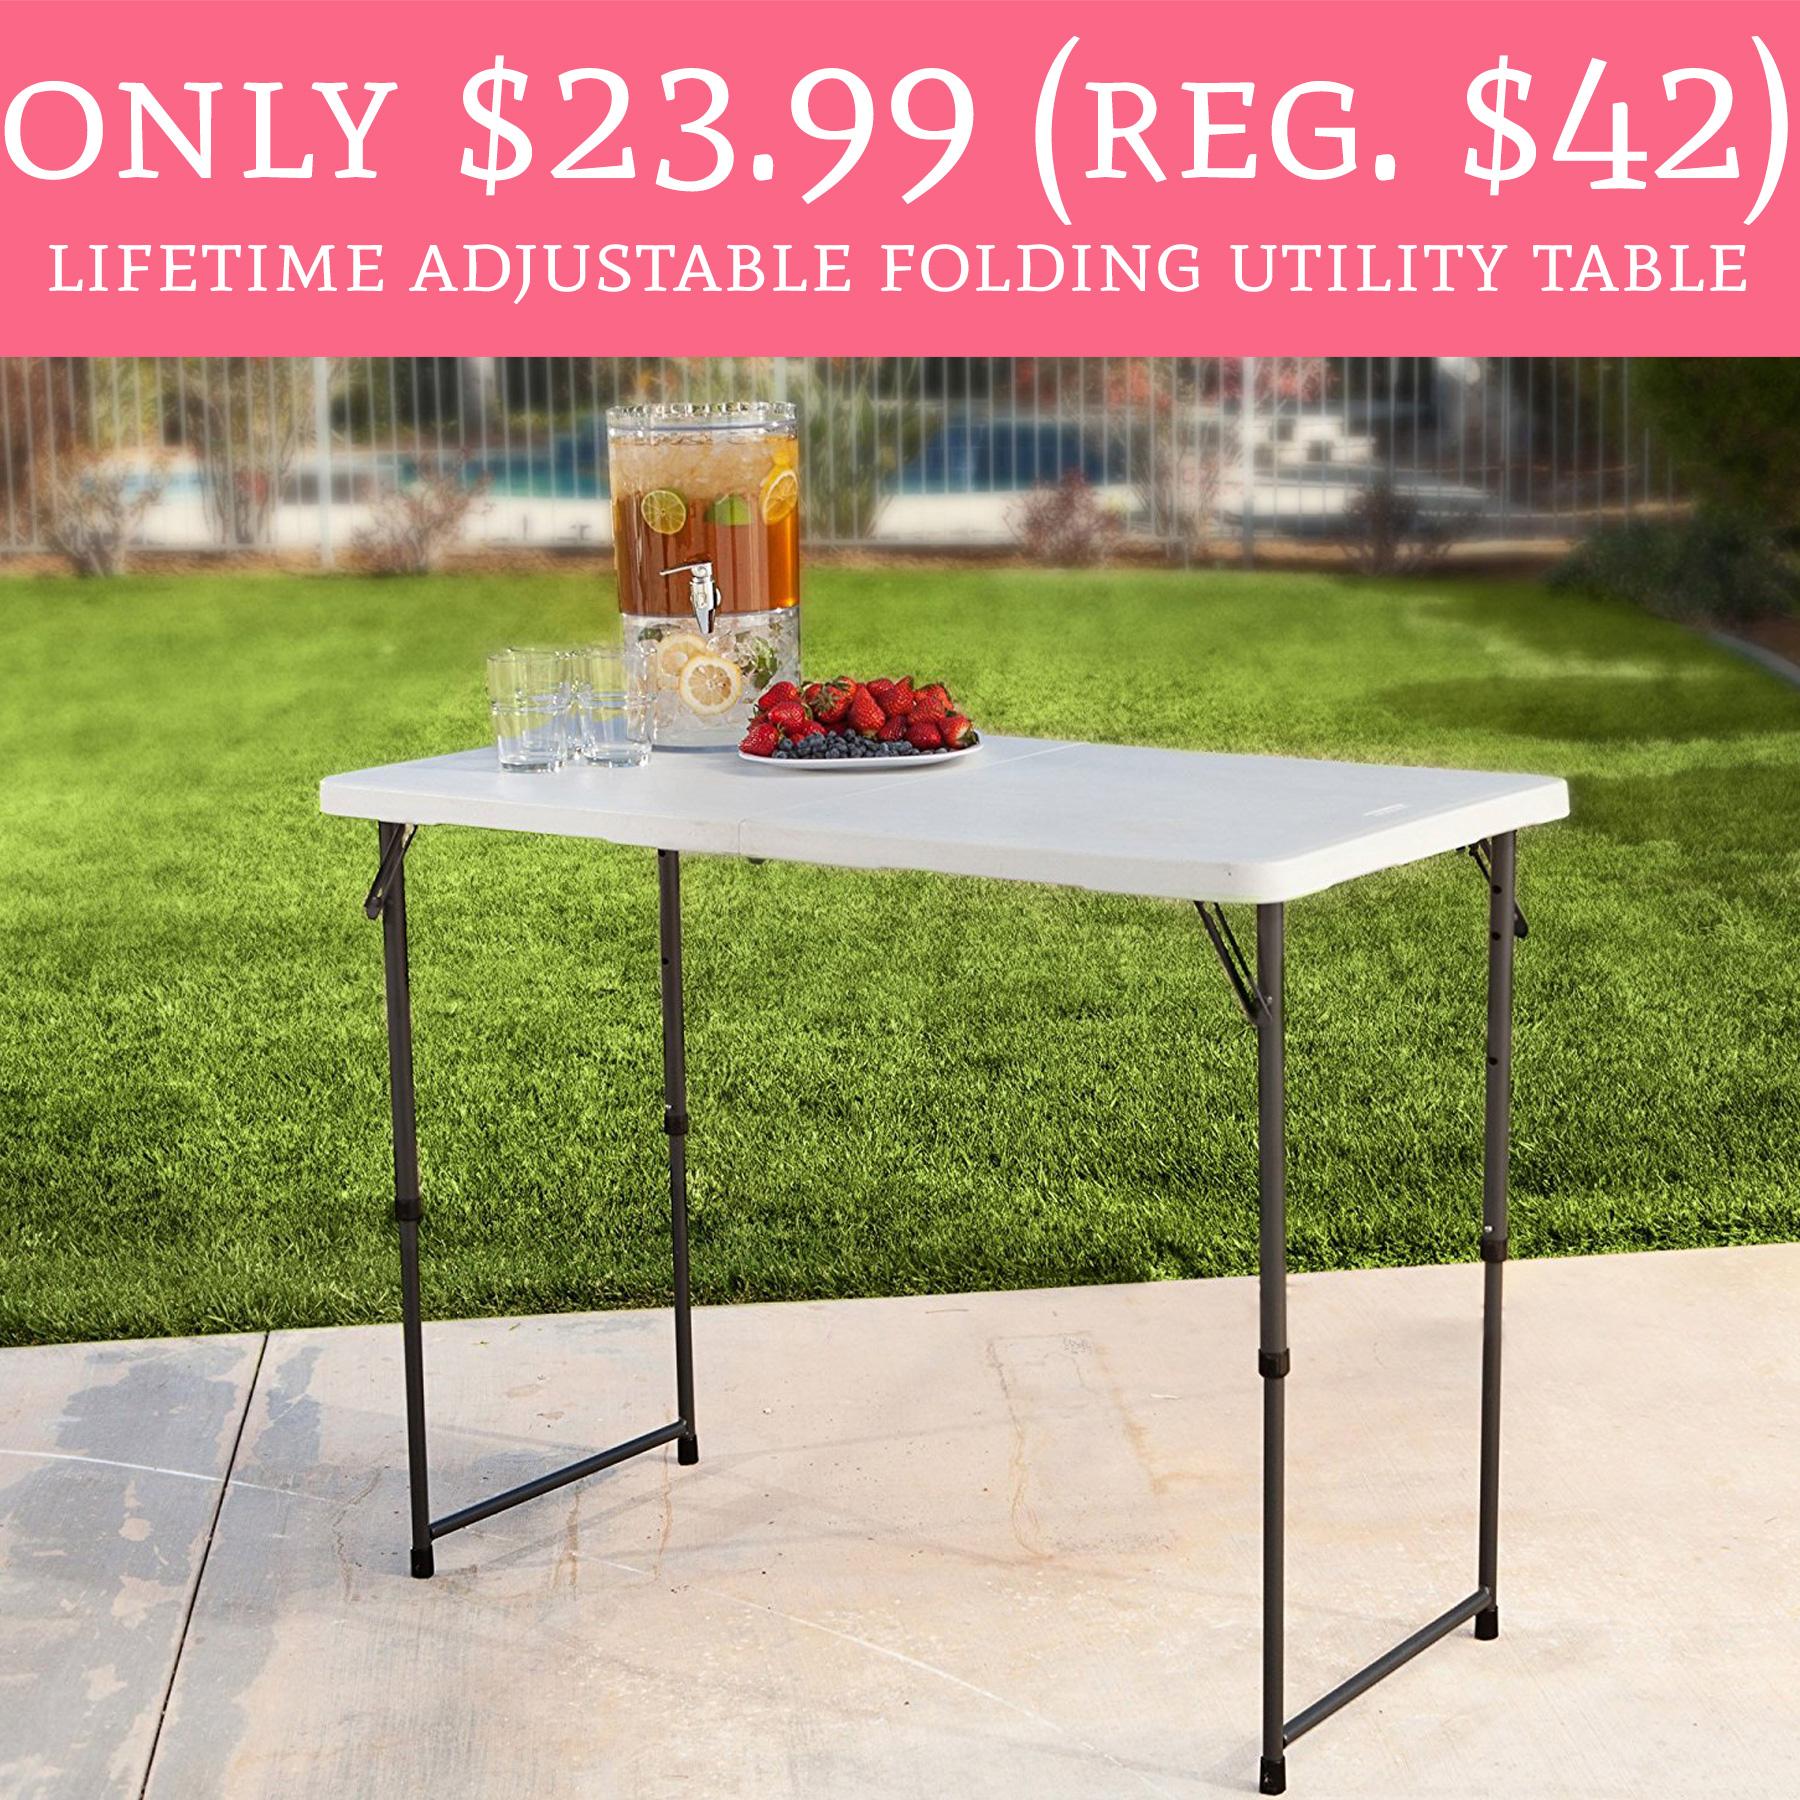 WOW ly $23 99 Regular $42 Lifetime Adjustable Folding Utility